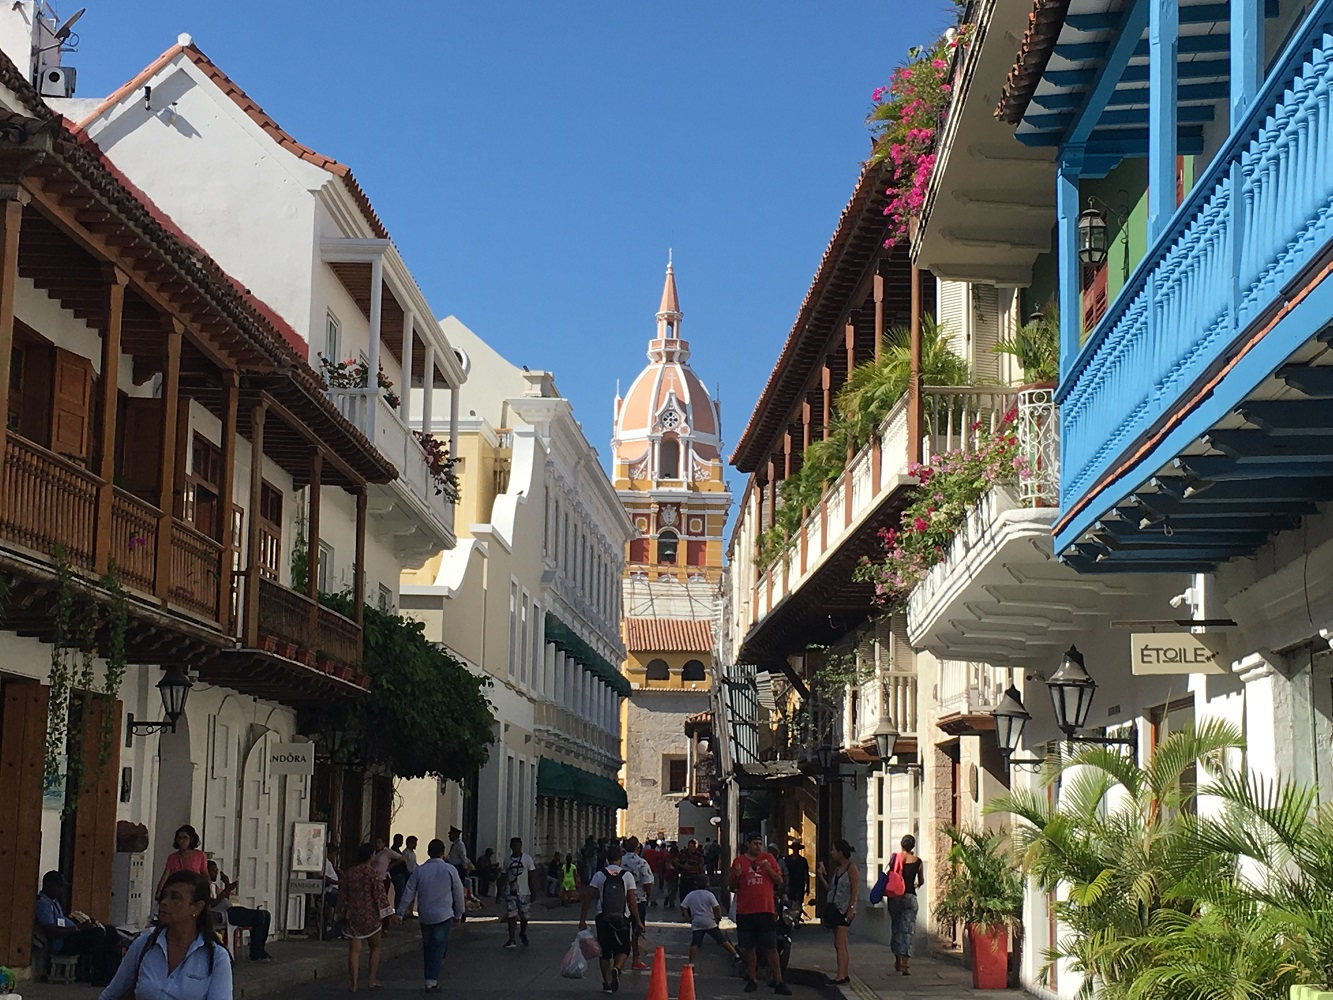 Mein Schiff Destination: Koloniale Altstadt von Cartagena - Kolumbien